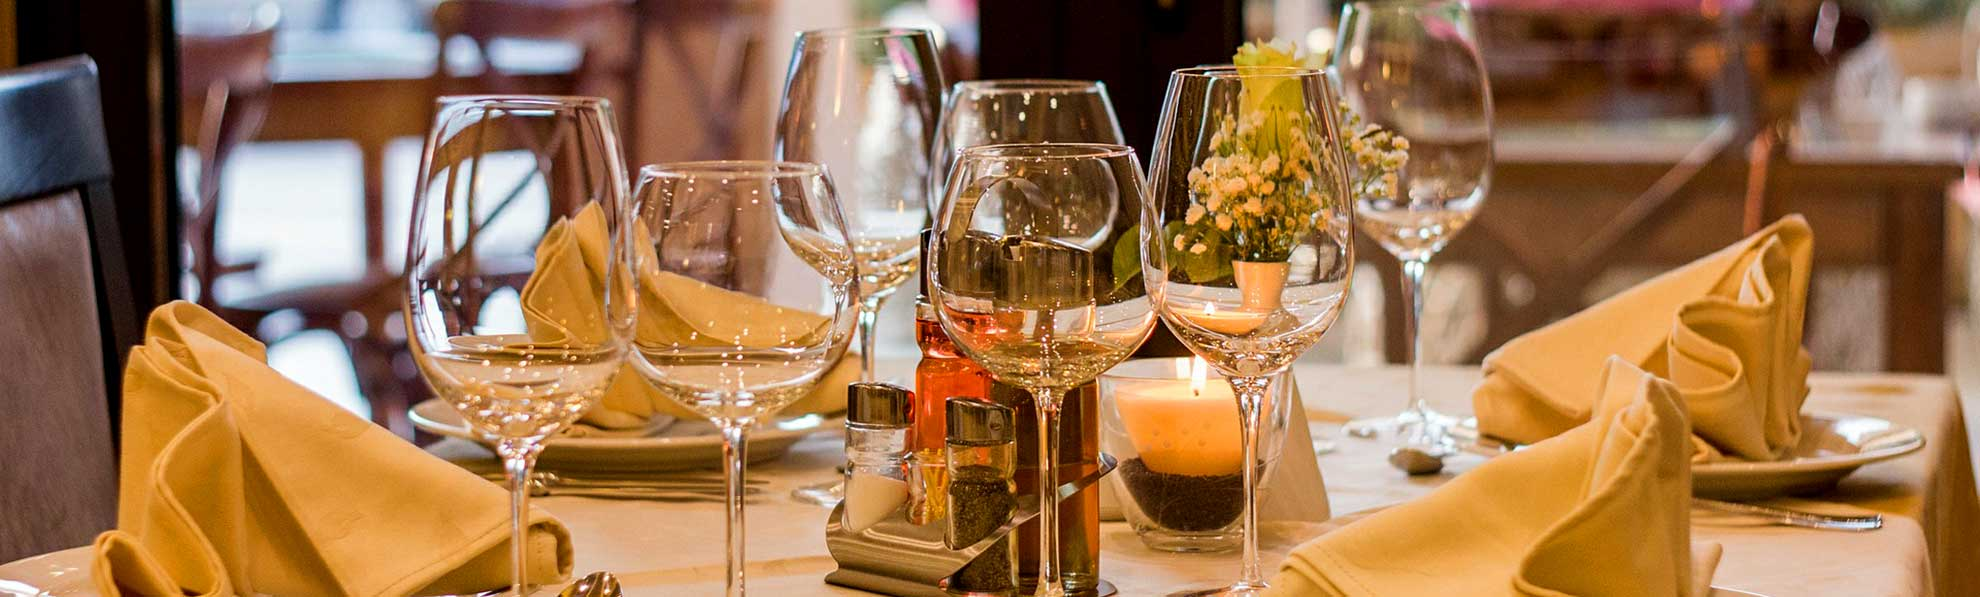 Mantra Indian Restaurant Bath. fine dining